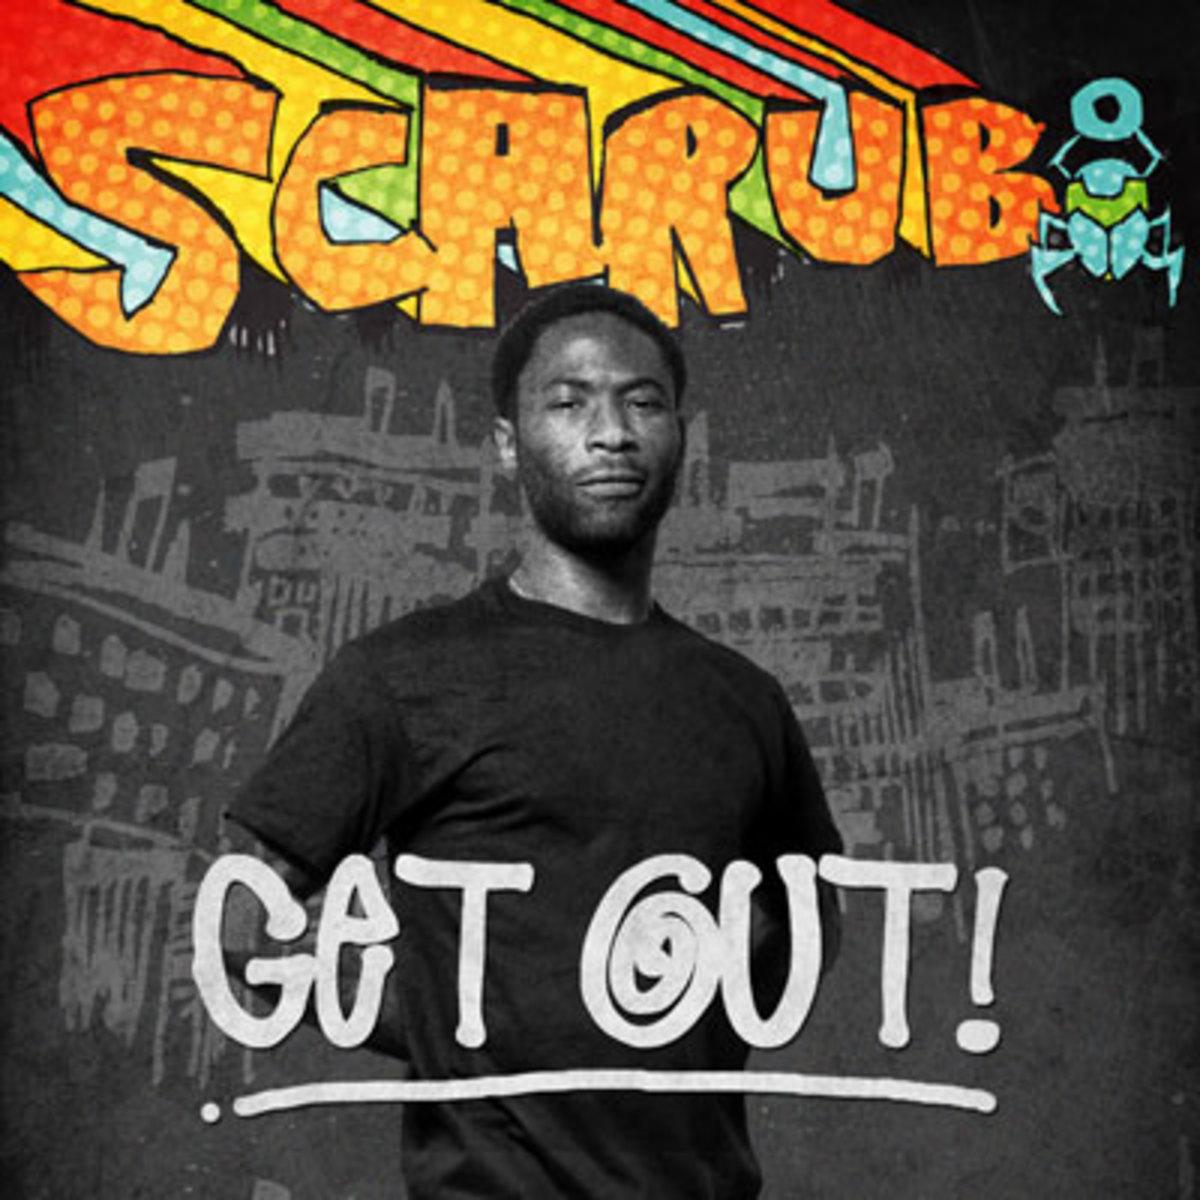 scarub-getout.jpg